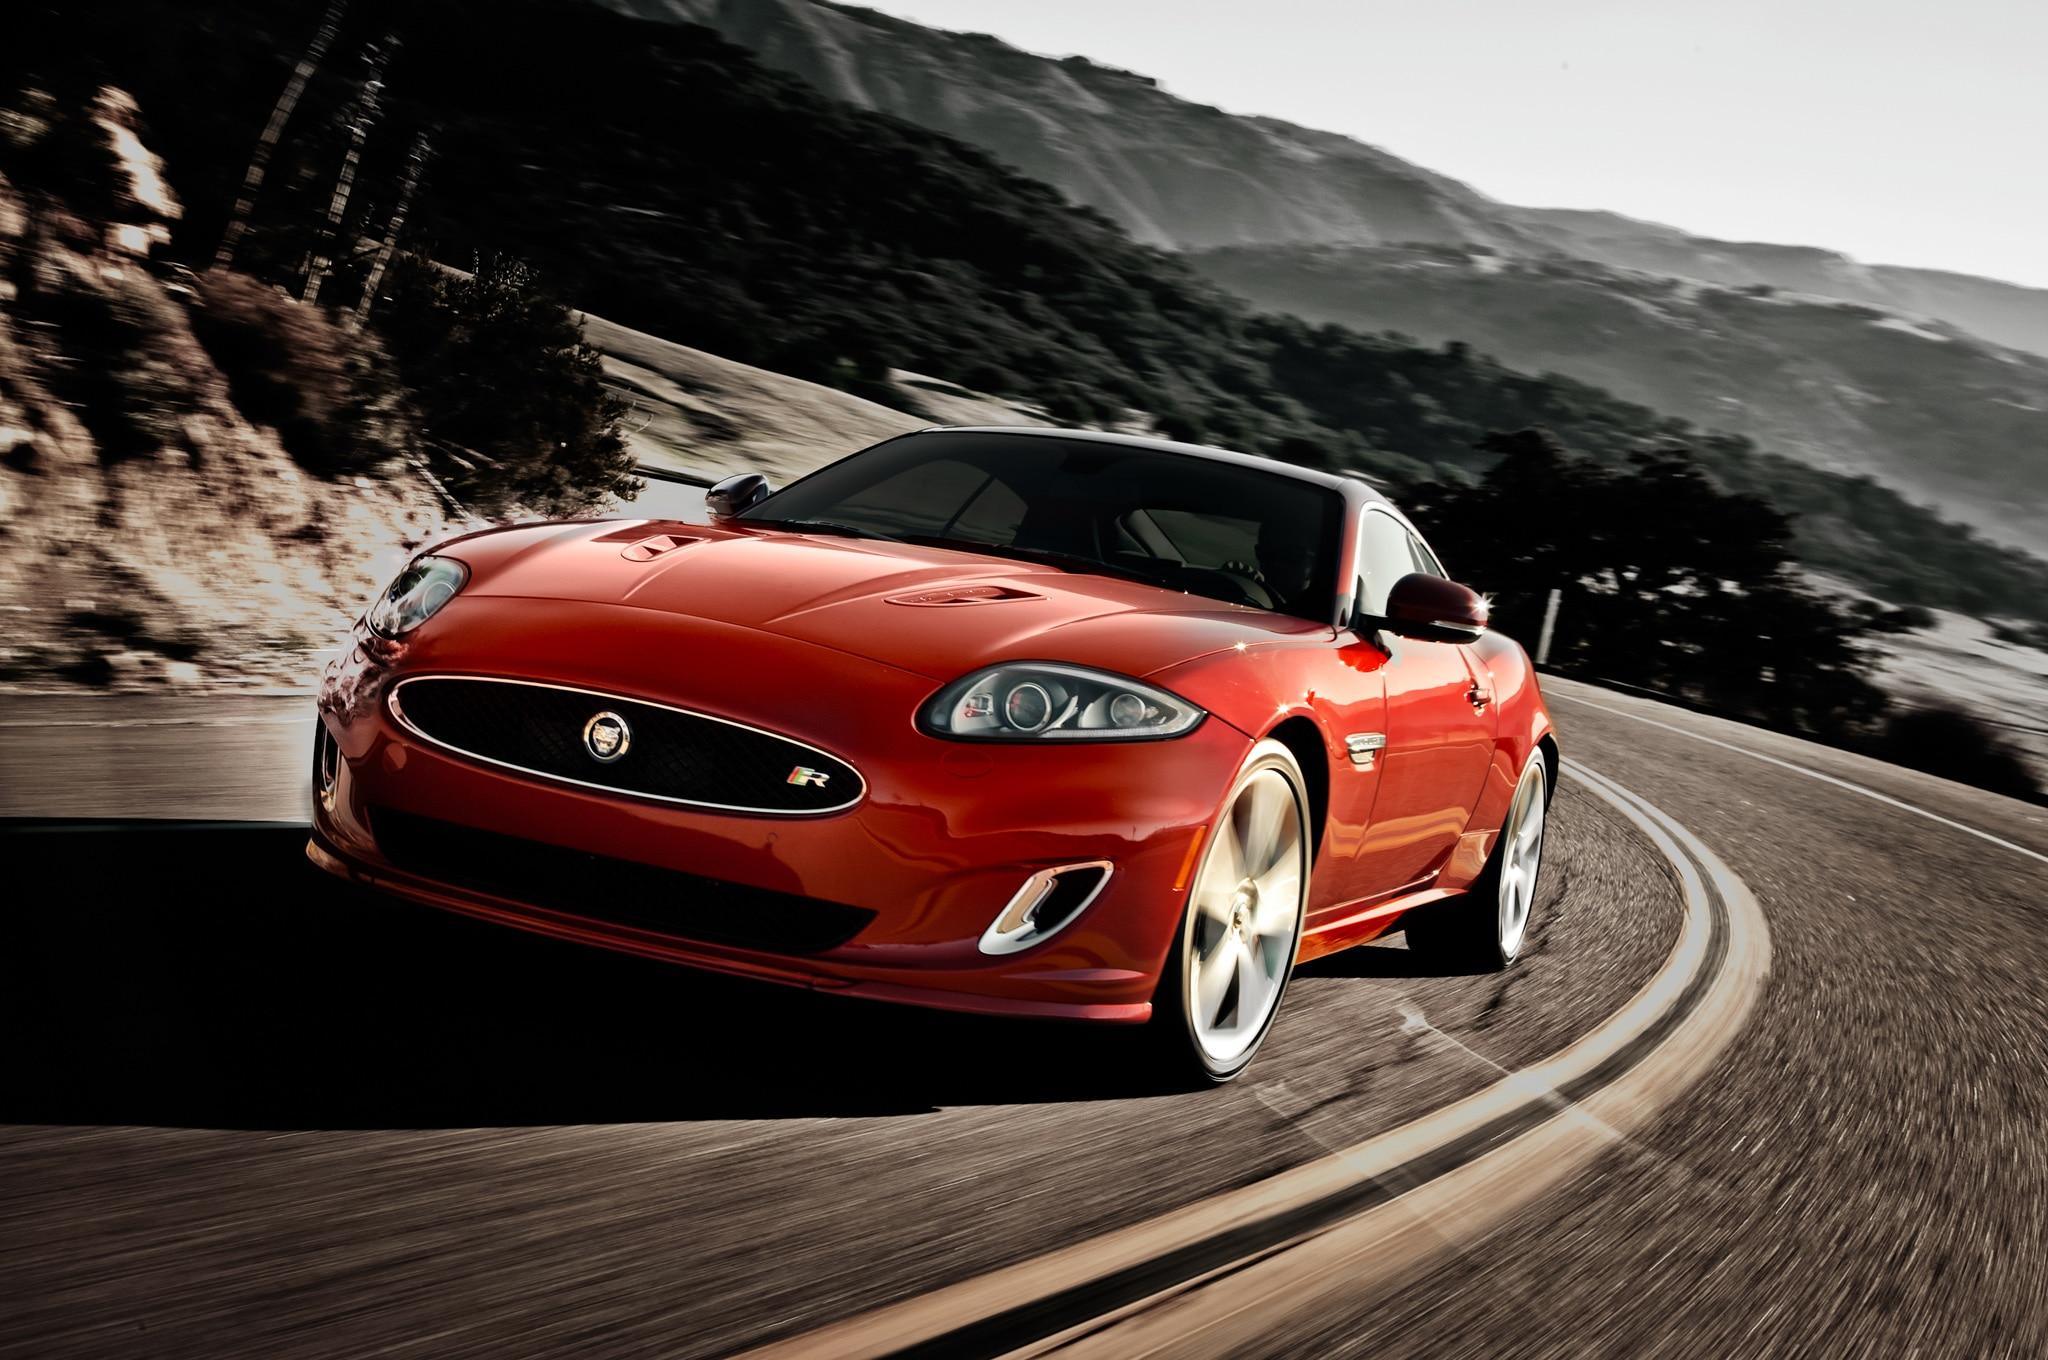 2013 jaguar xk base price drops to 79 875 xkr drop top. Black Bedroom Furniture Sets. Home Design Ideas